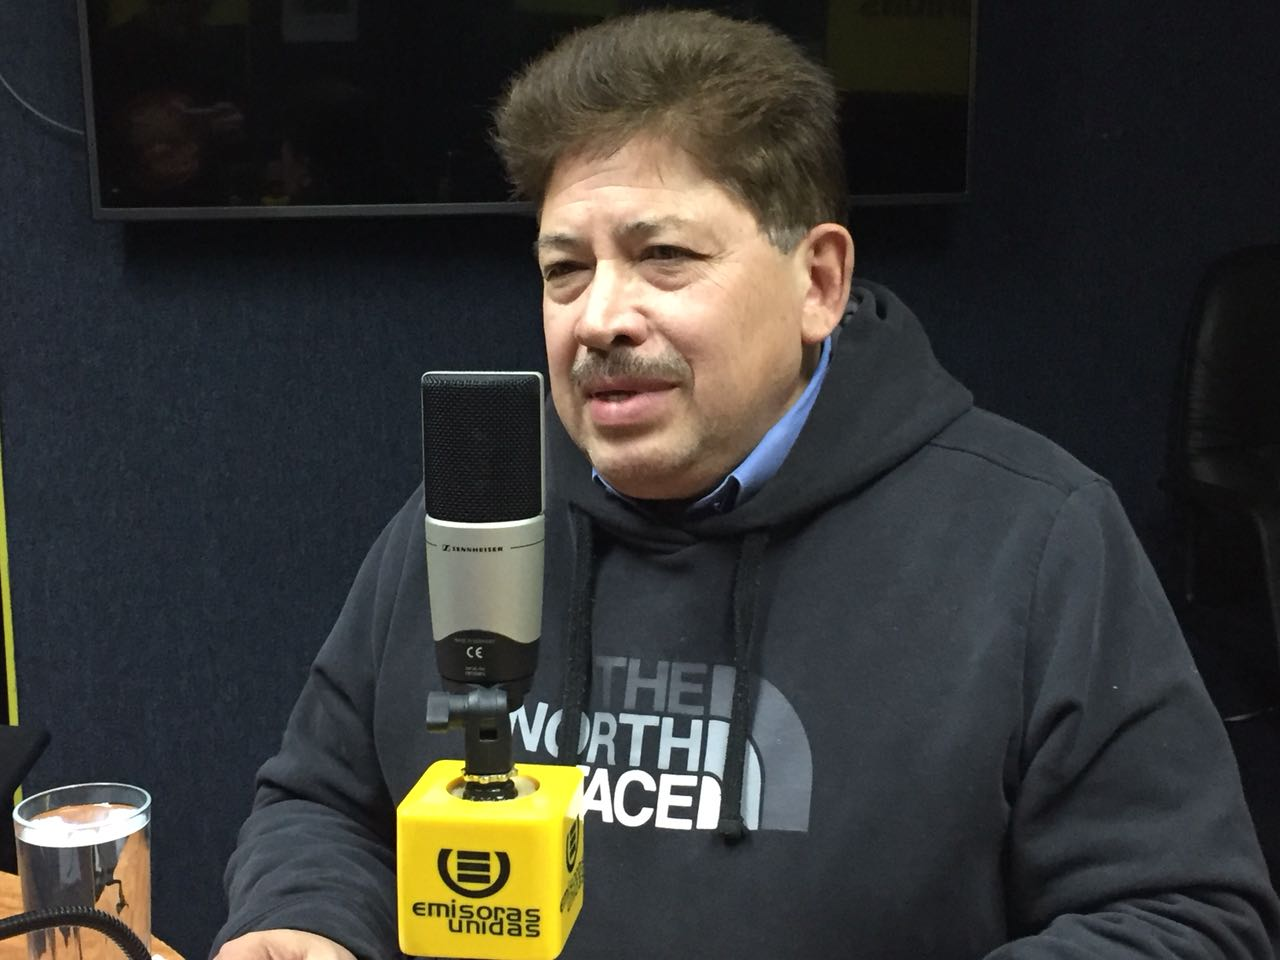 Edgar Castro Bathen EU Emisoras Unidas Guatemala